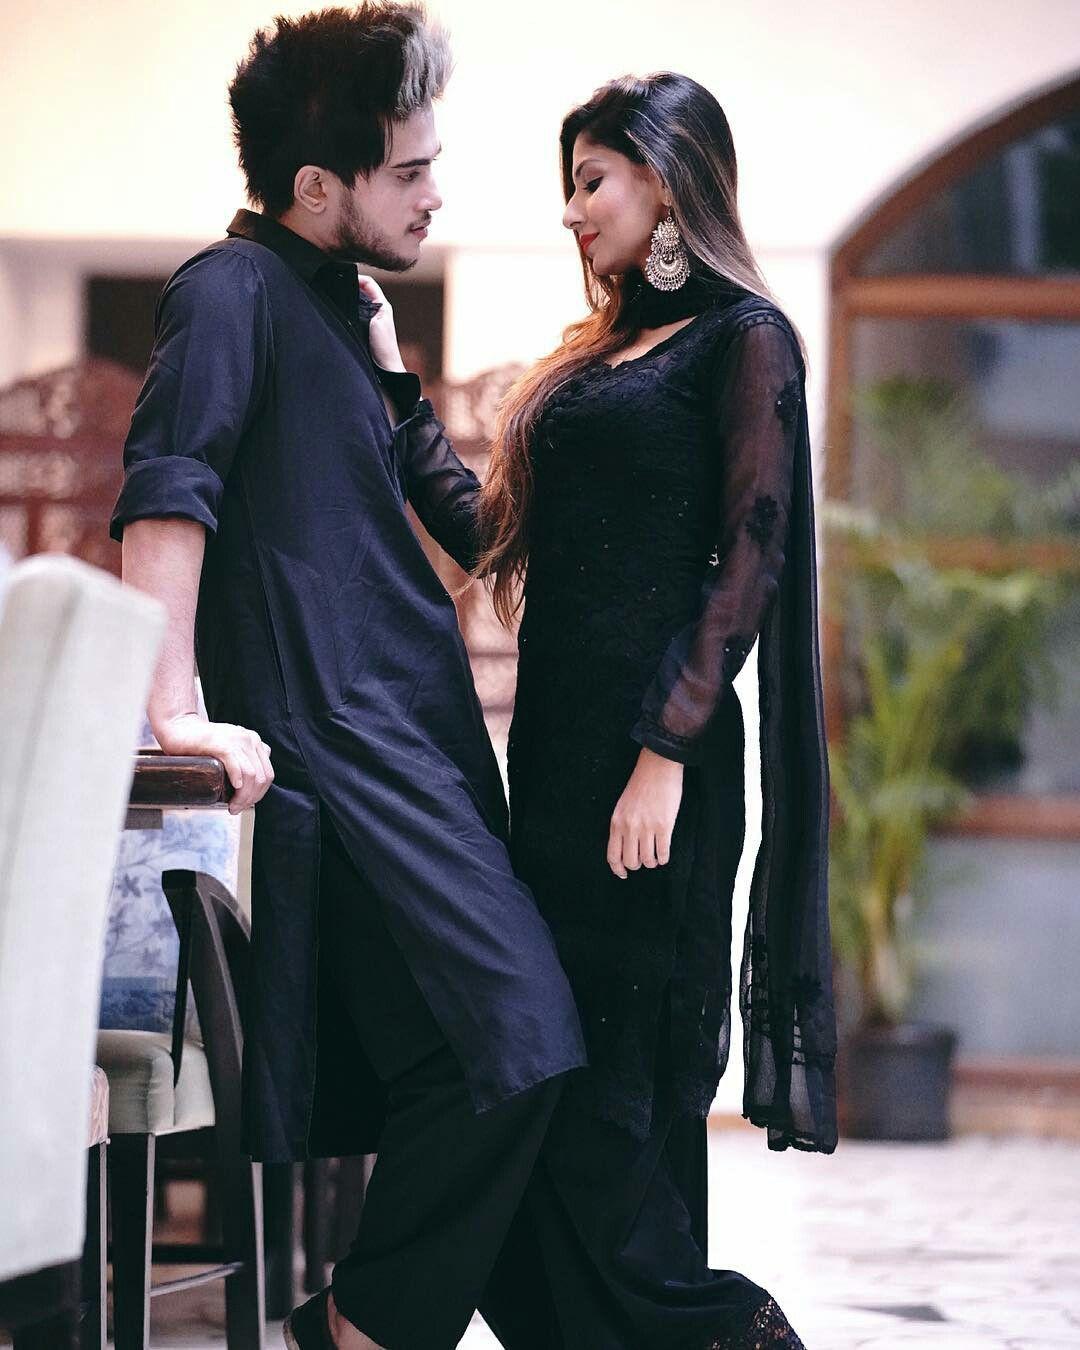 Cute Couple Follow Me Misha Verma Cute Couples In 2019 Cute